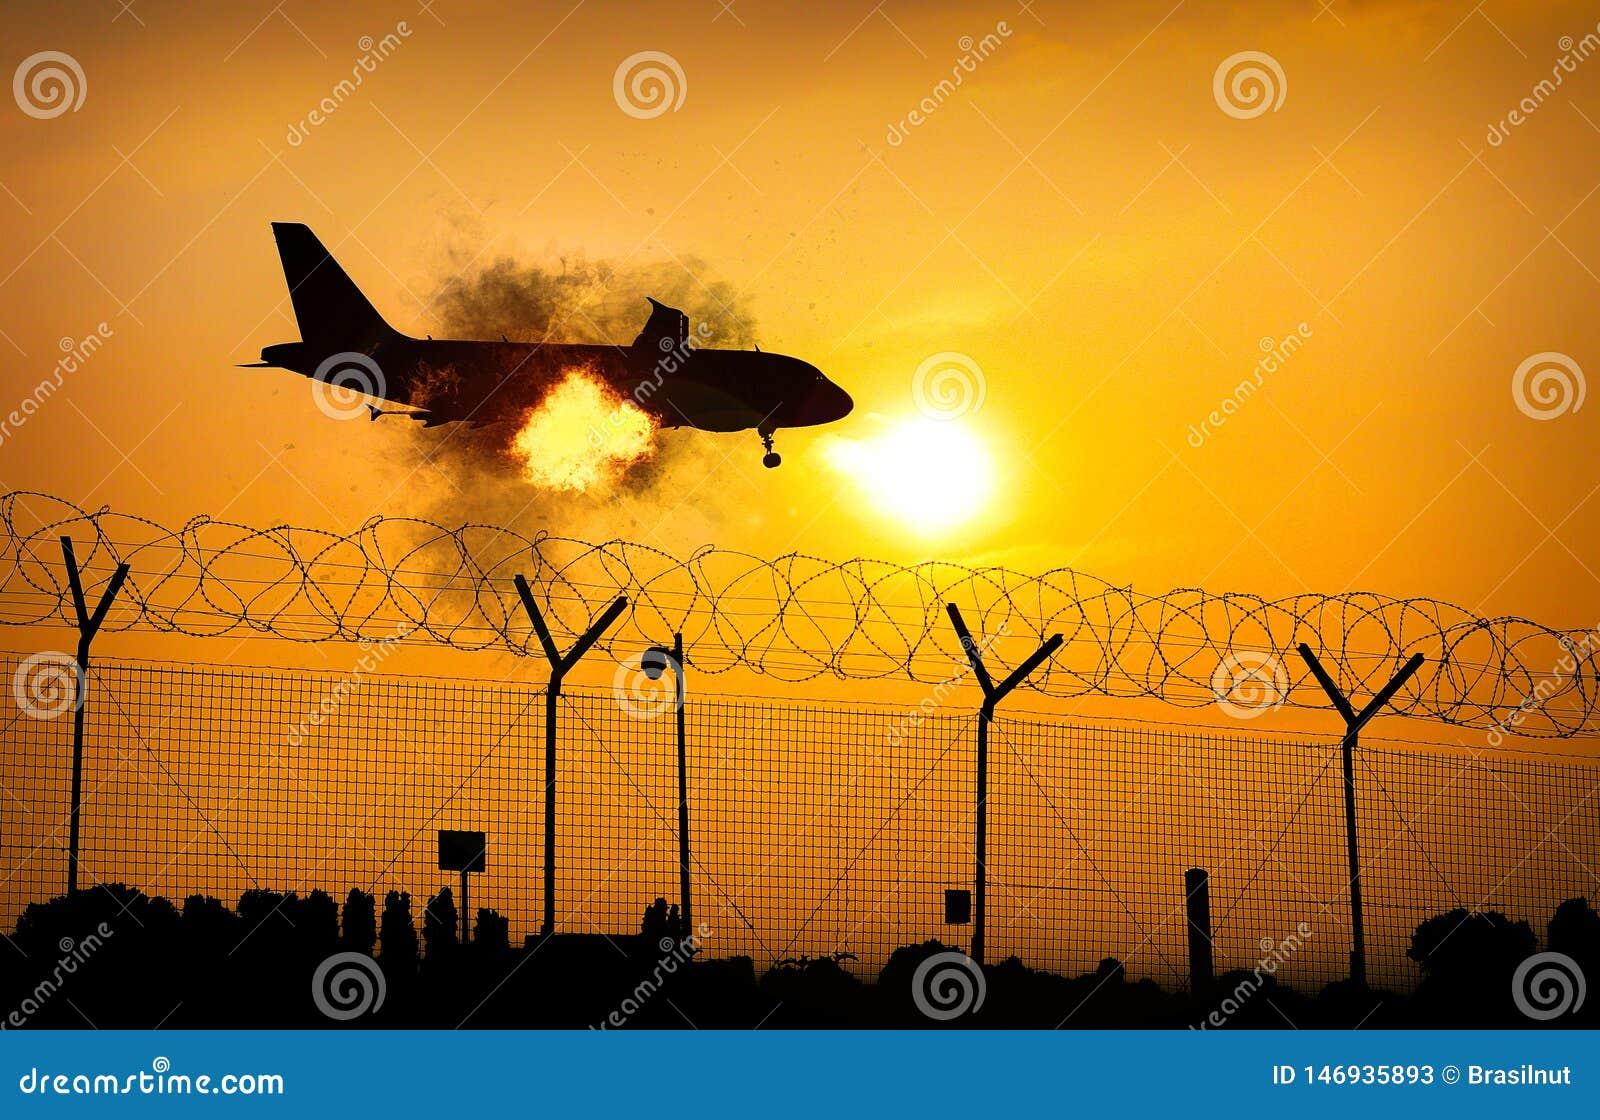 Airplane on fire in midair close to ground - digital manipulation